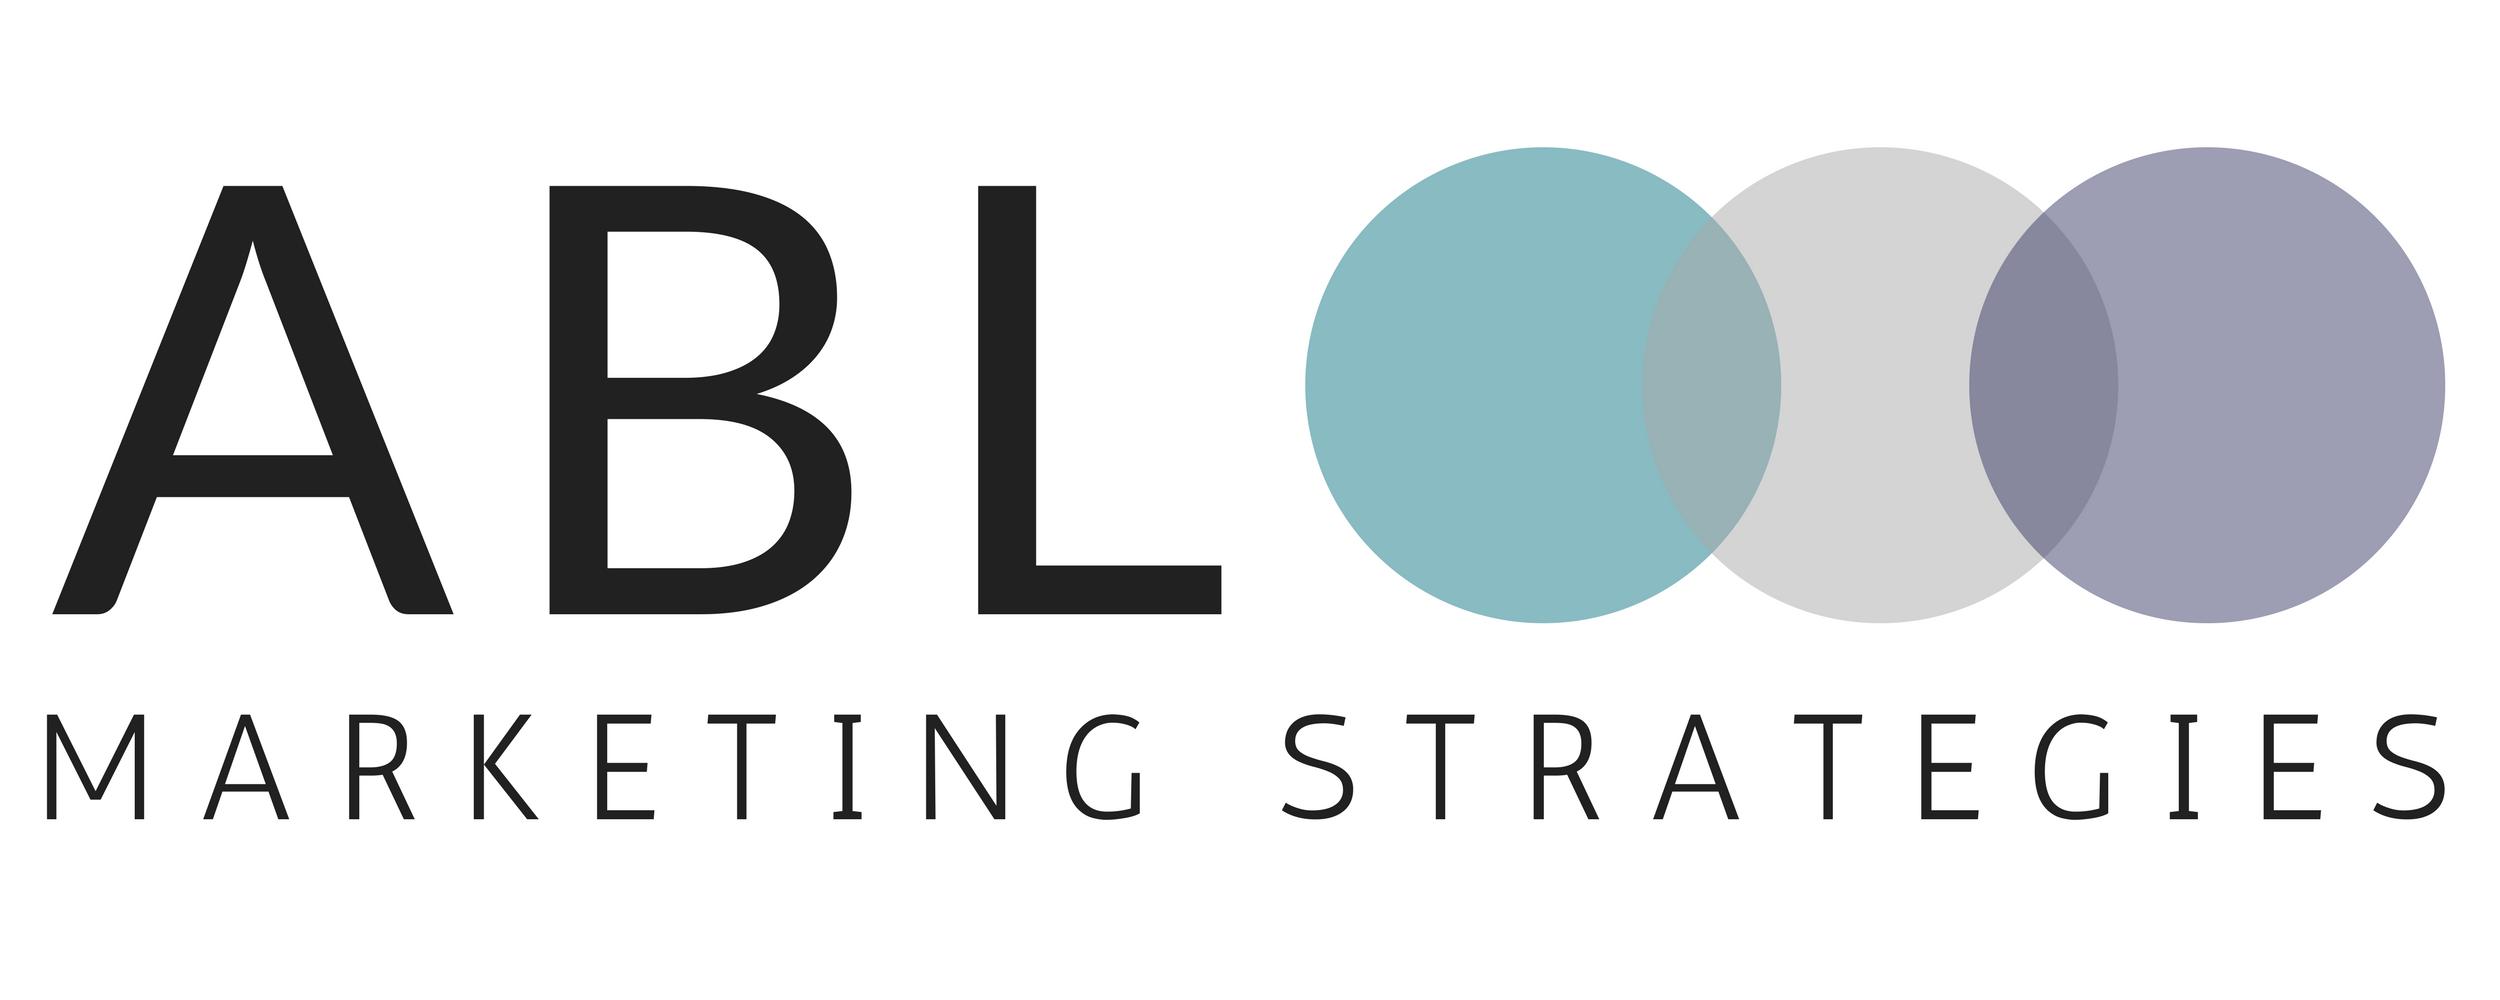 ABL Marketing Strategies Final Logo.png